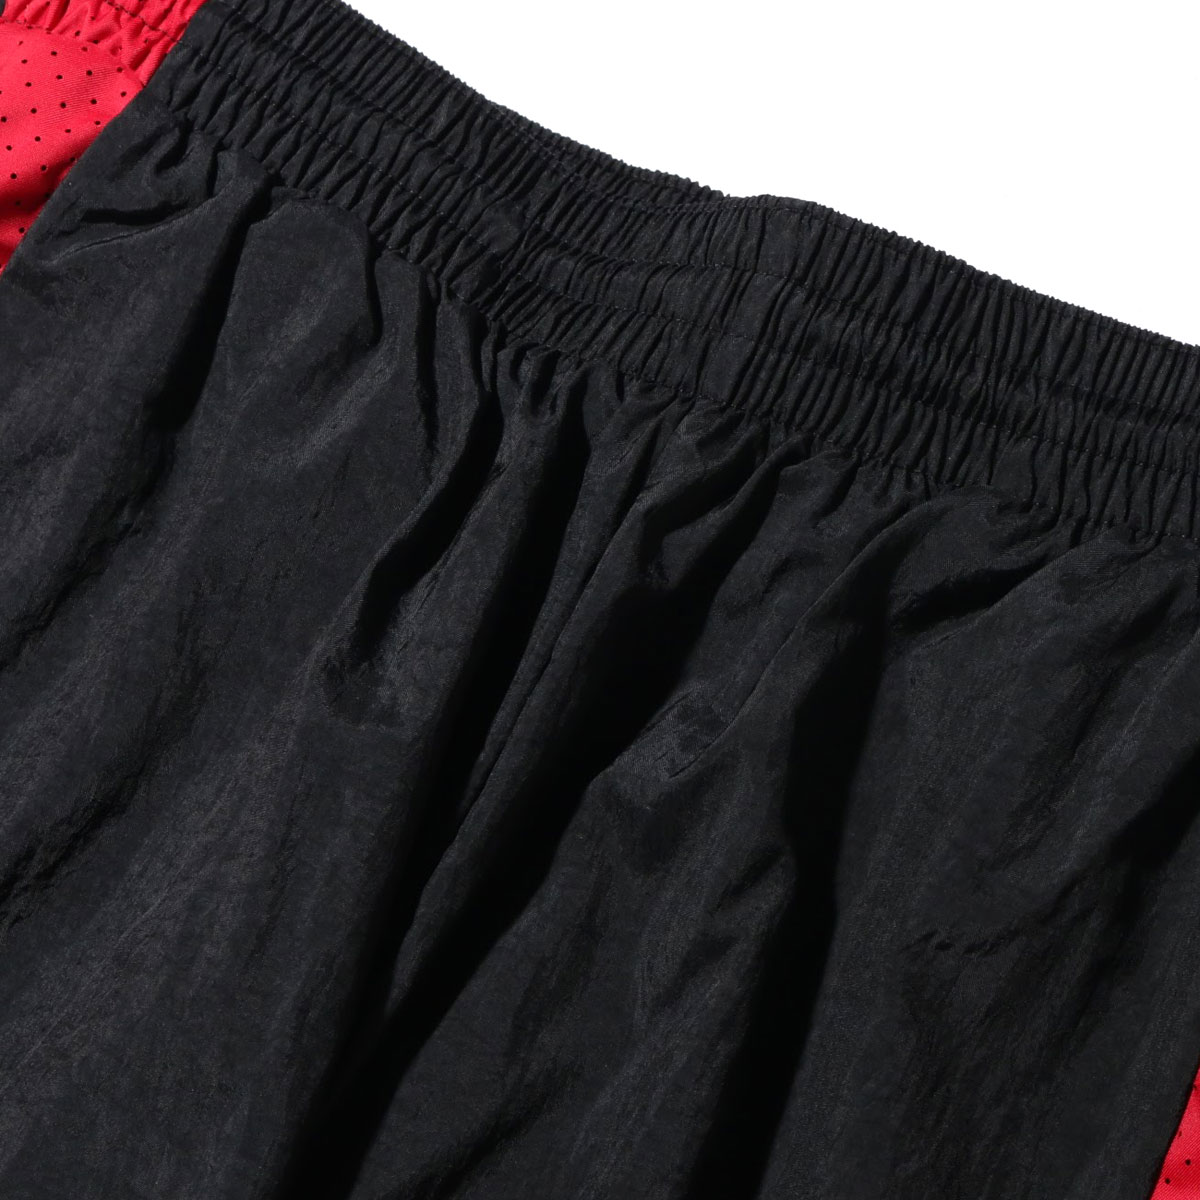 297c8369bbf07e NIKE JSW WINGS MUSCLE PANT (Nike Jordan JSW WINGS muscle underwear)  (BLACK GYM RED (BLACK)) 17HO-S